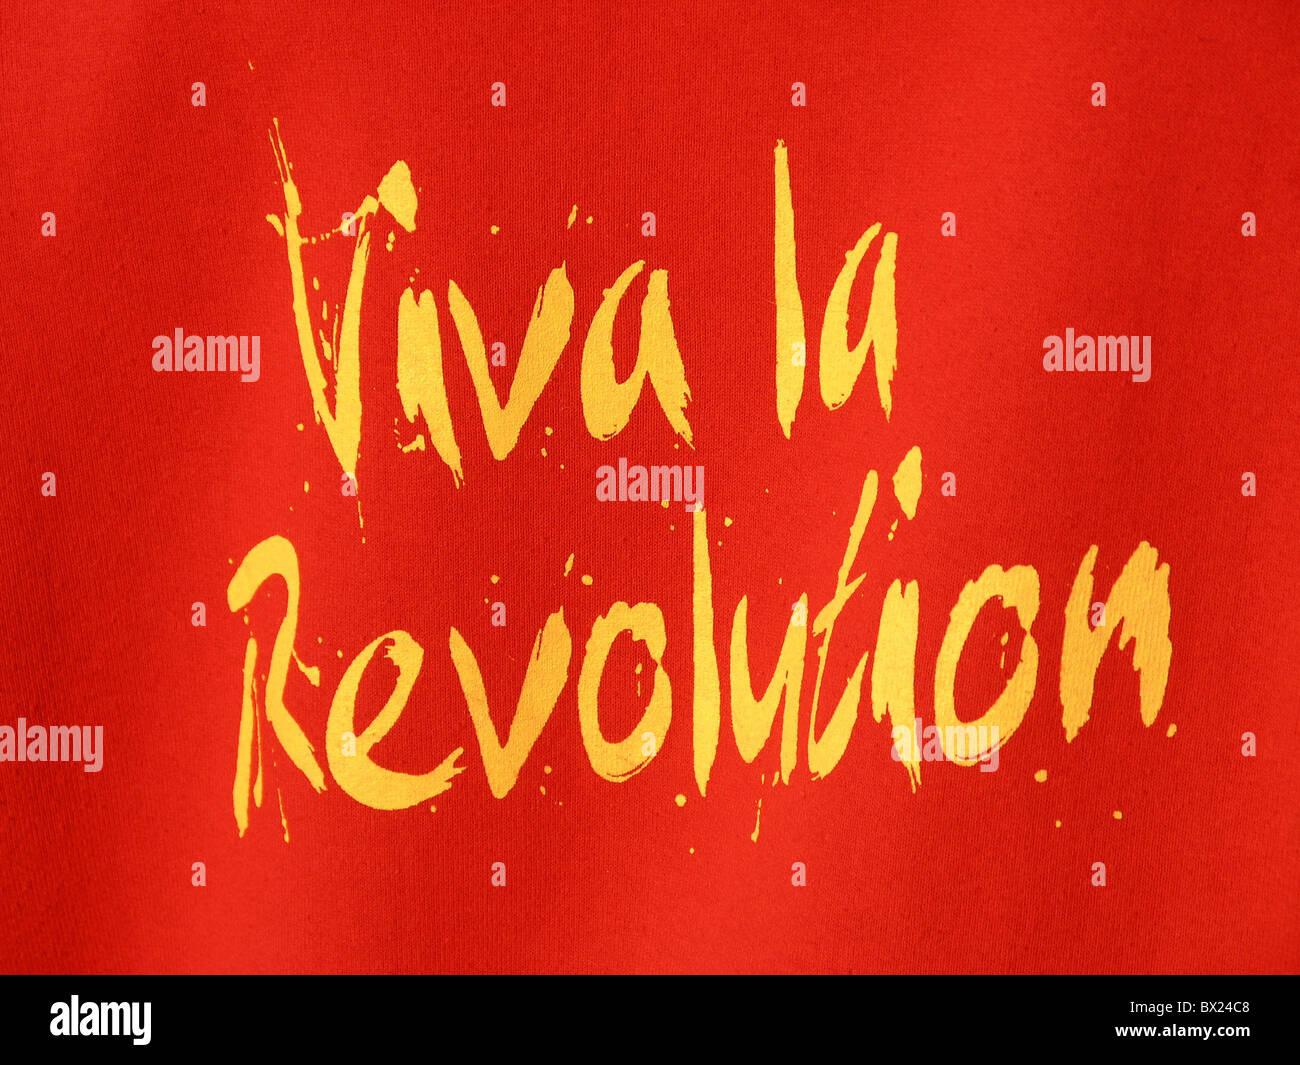 policy politics red revolt stroke symbol Viva la revolution yellow - Stock Image